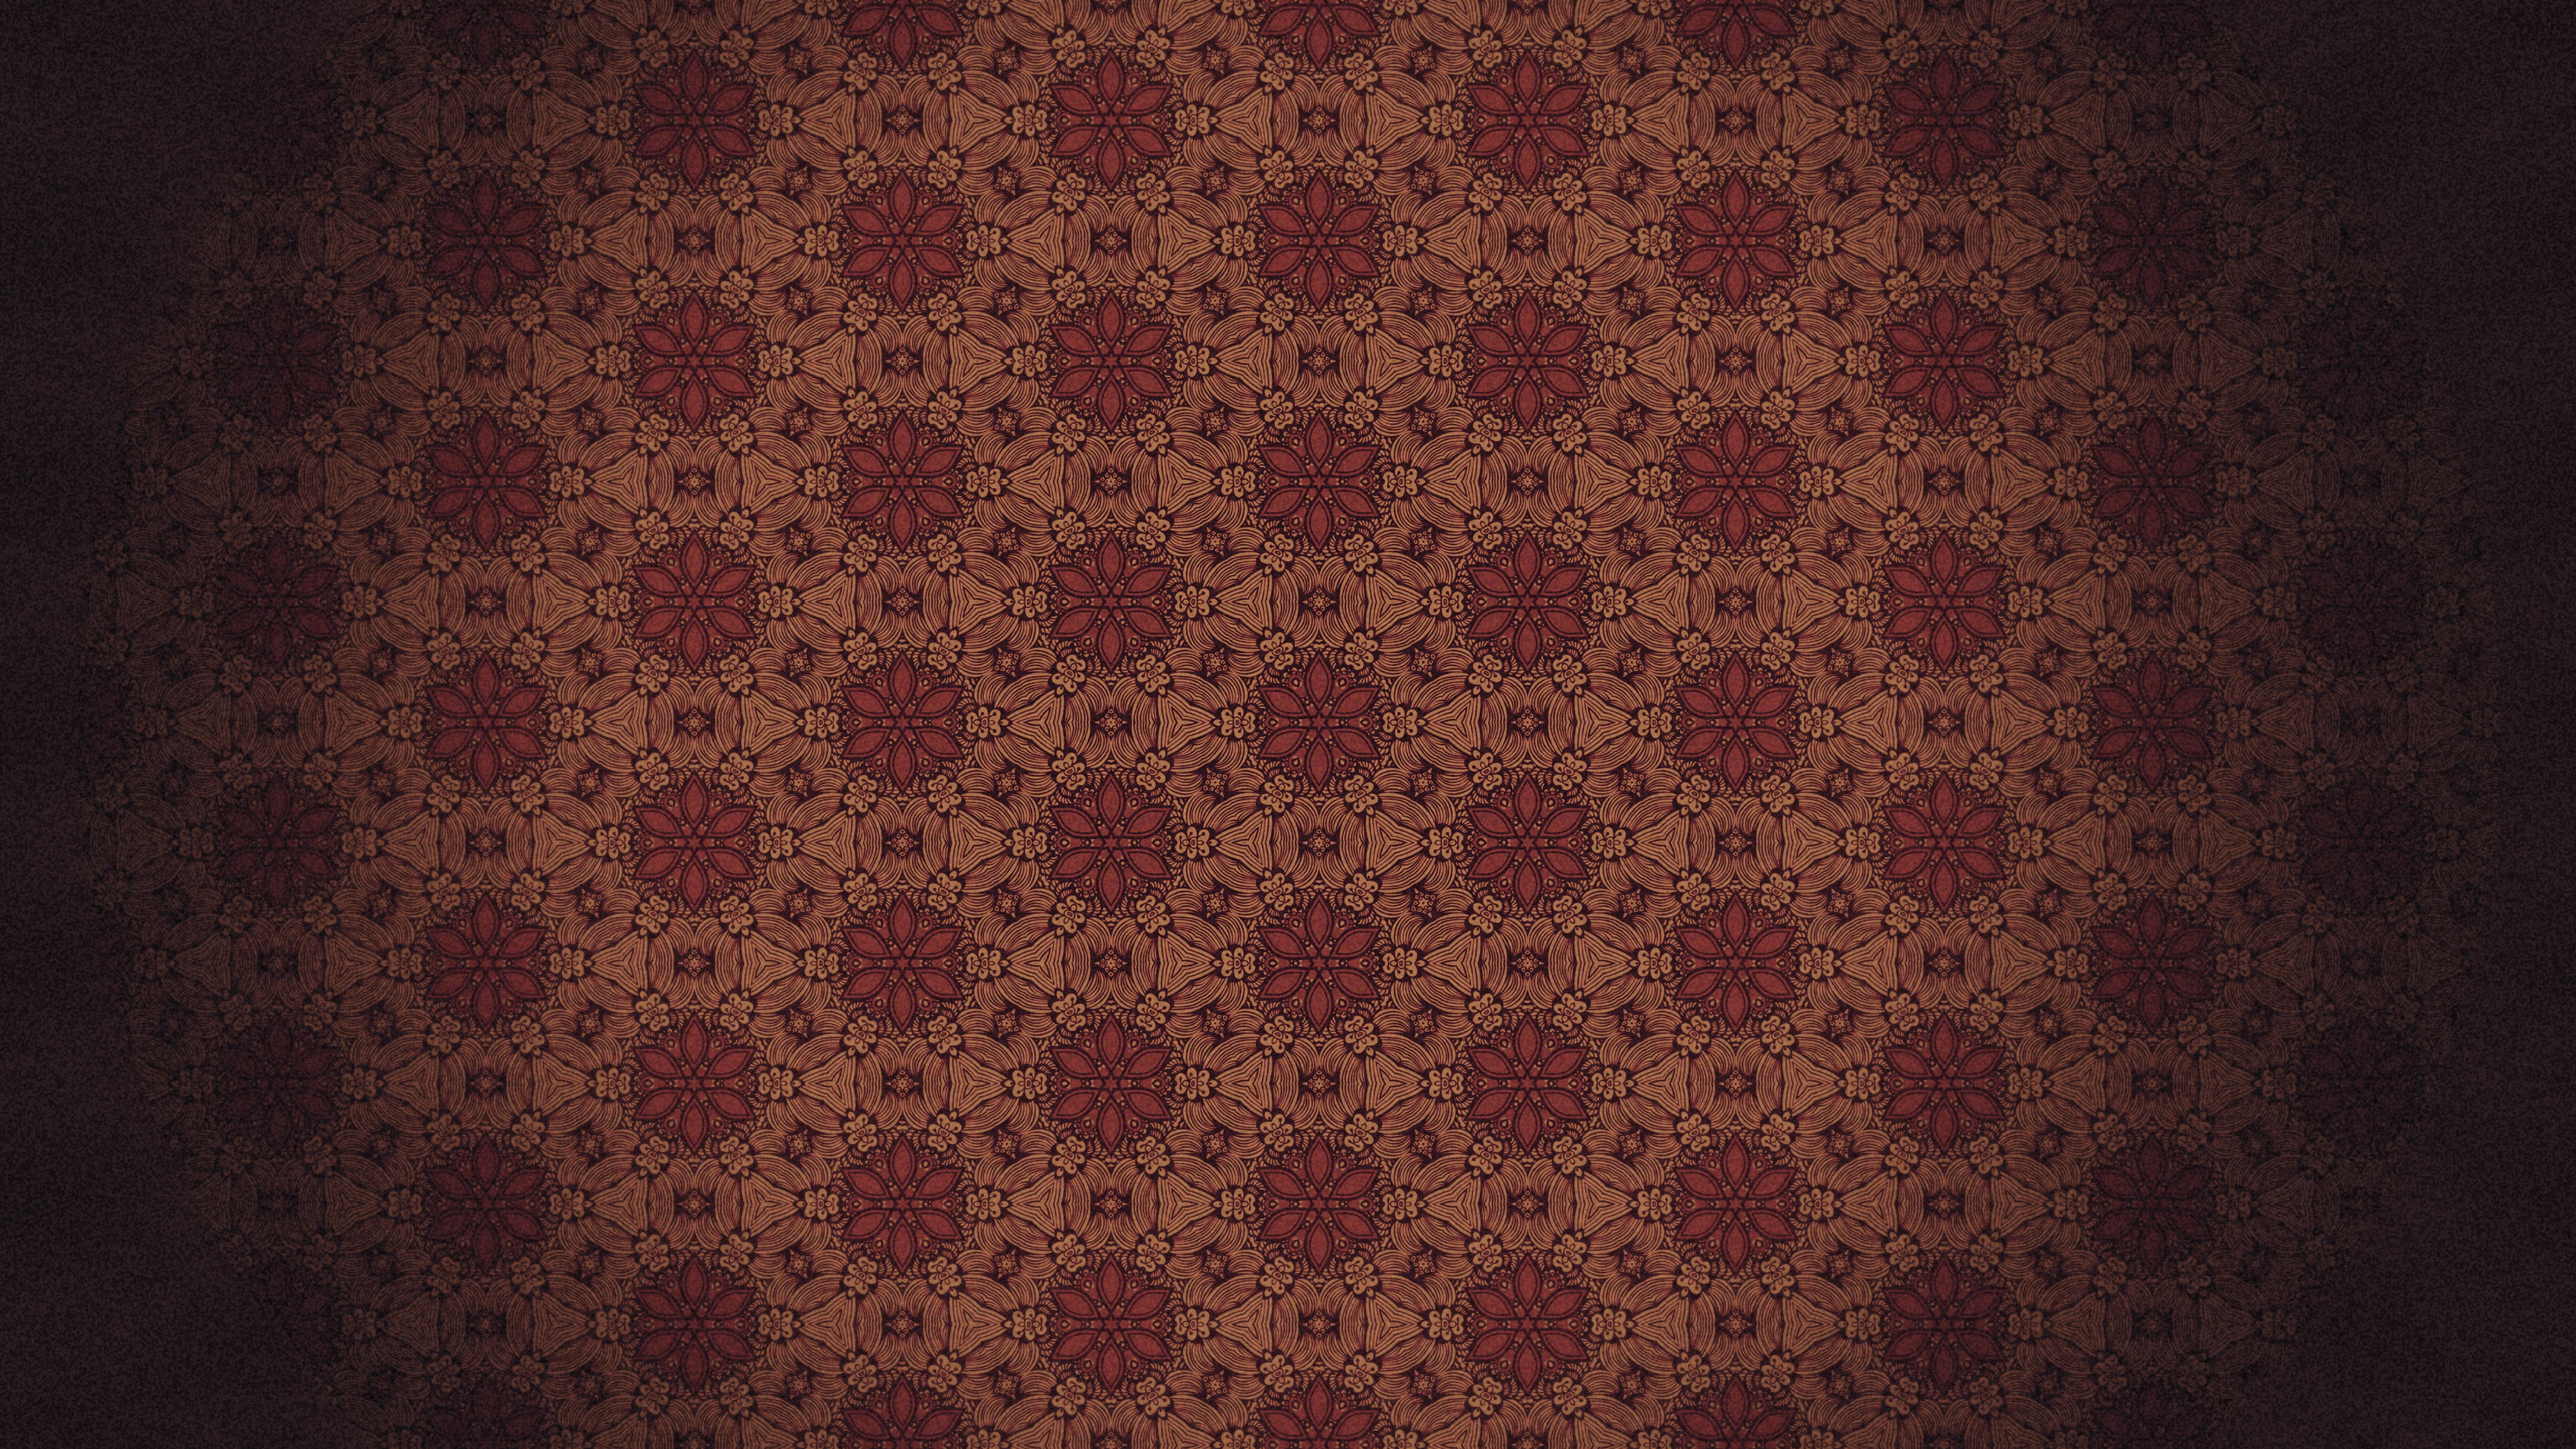 Red And Black Vintage Floral Seamless Pattern Wallpaper Design